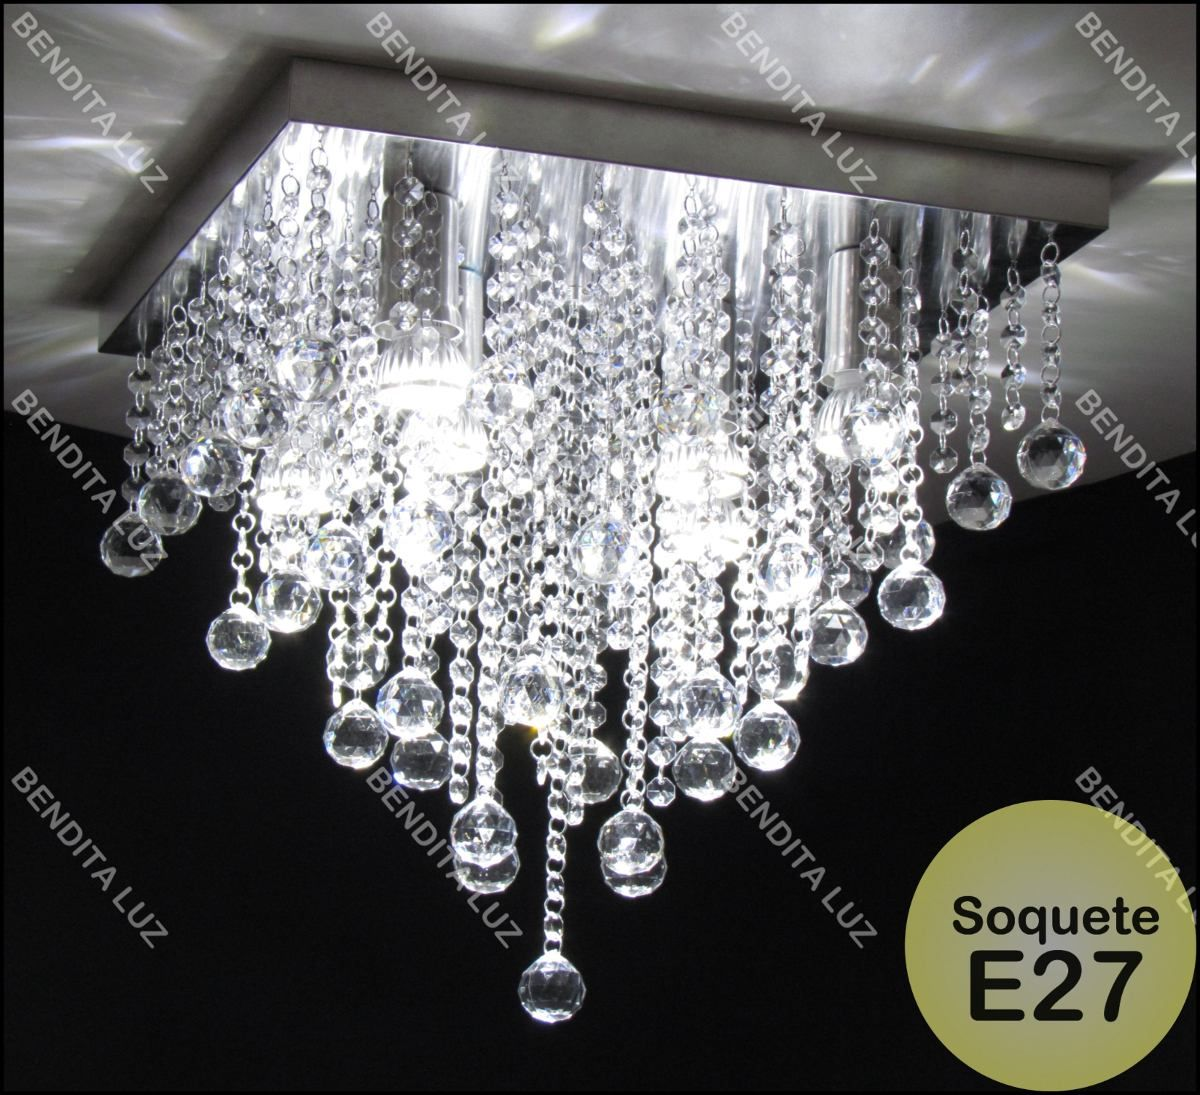 lustre plafon de cristal acrílico a44 base inox 40x40cm e27 ...